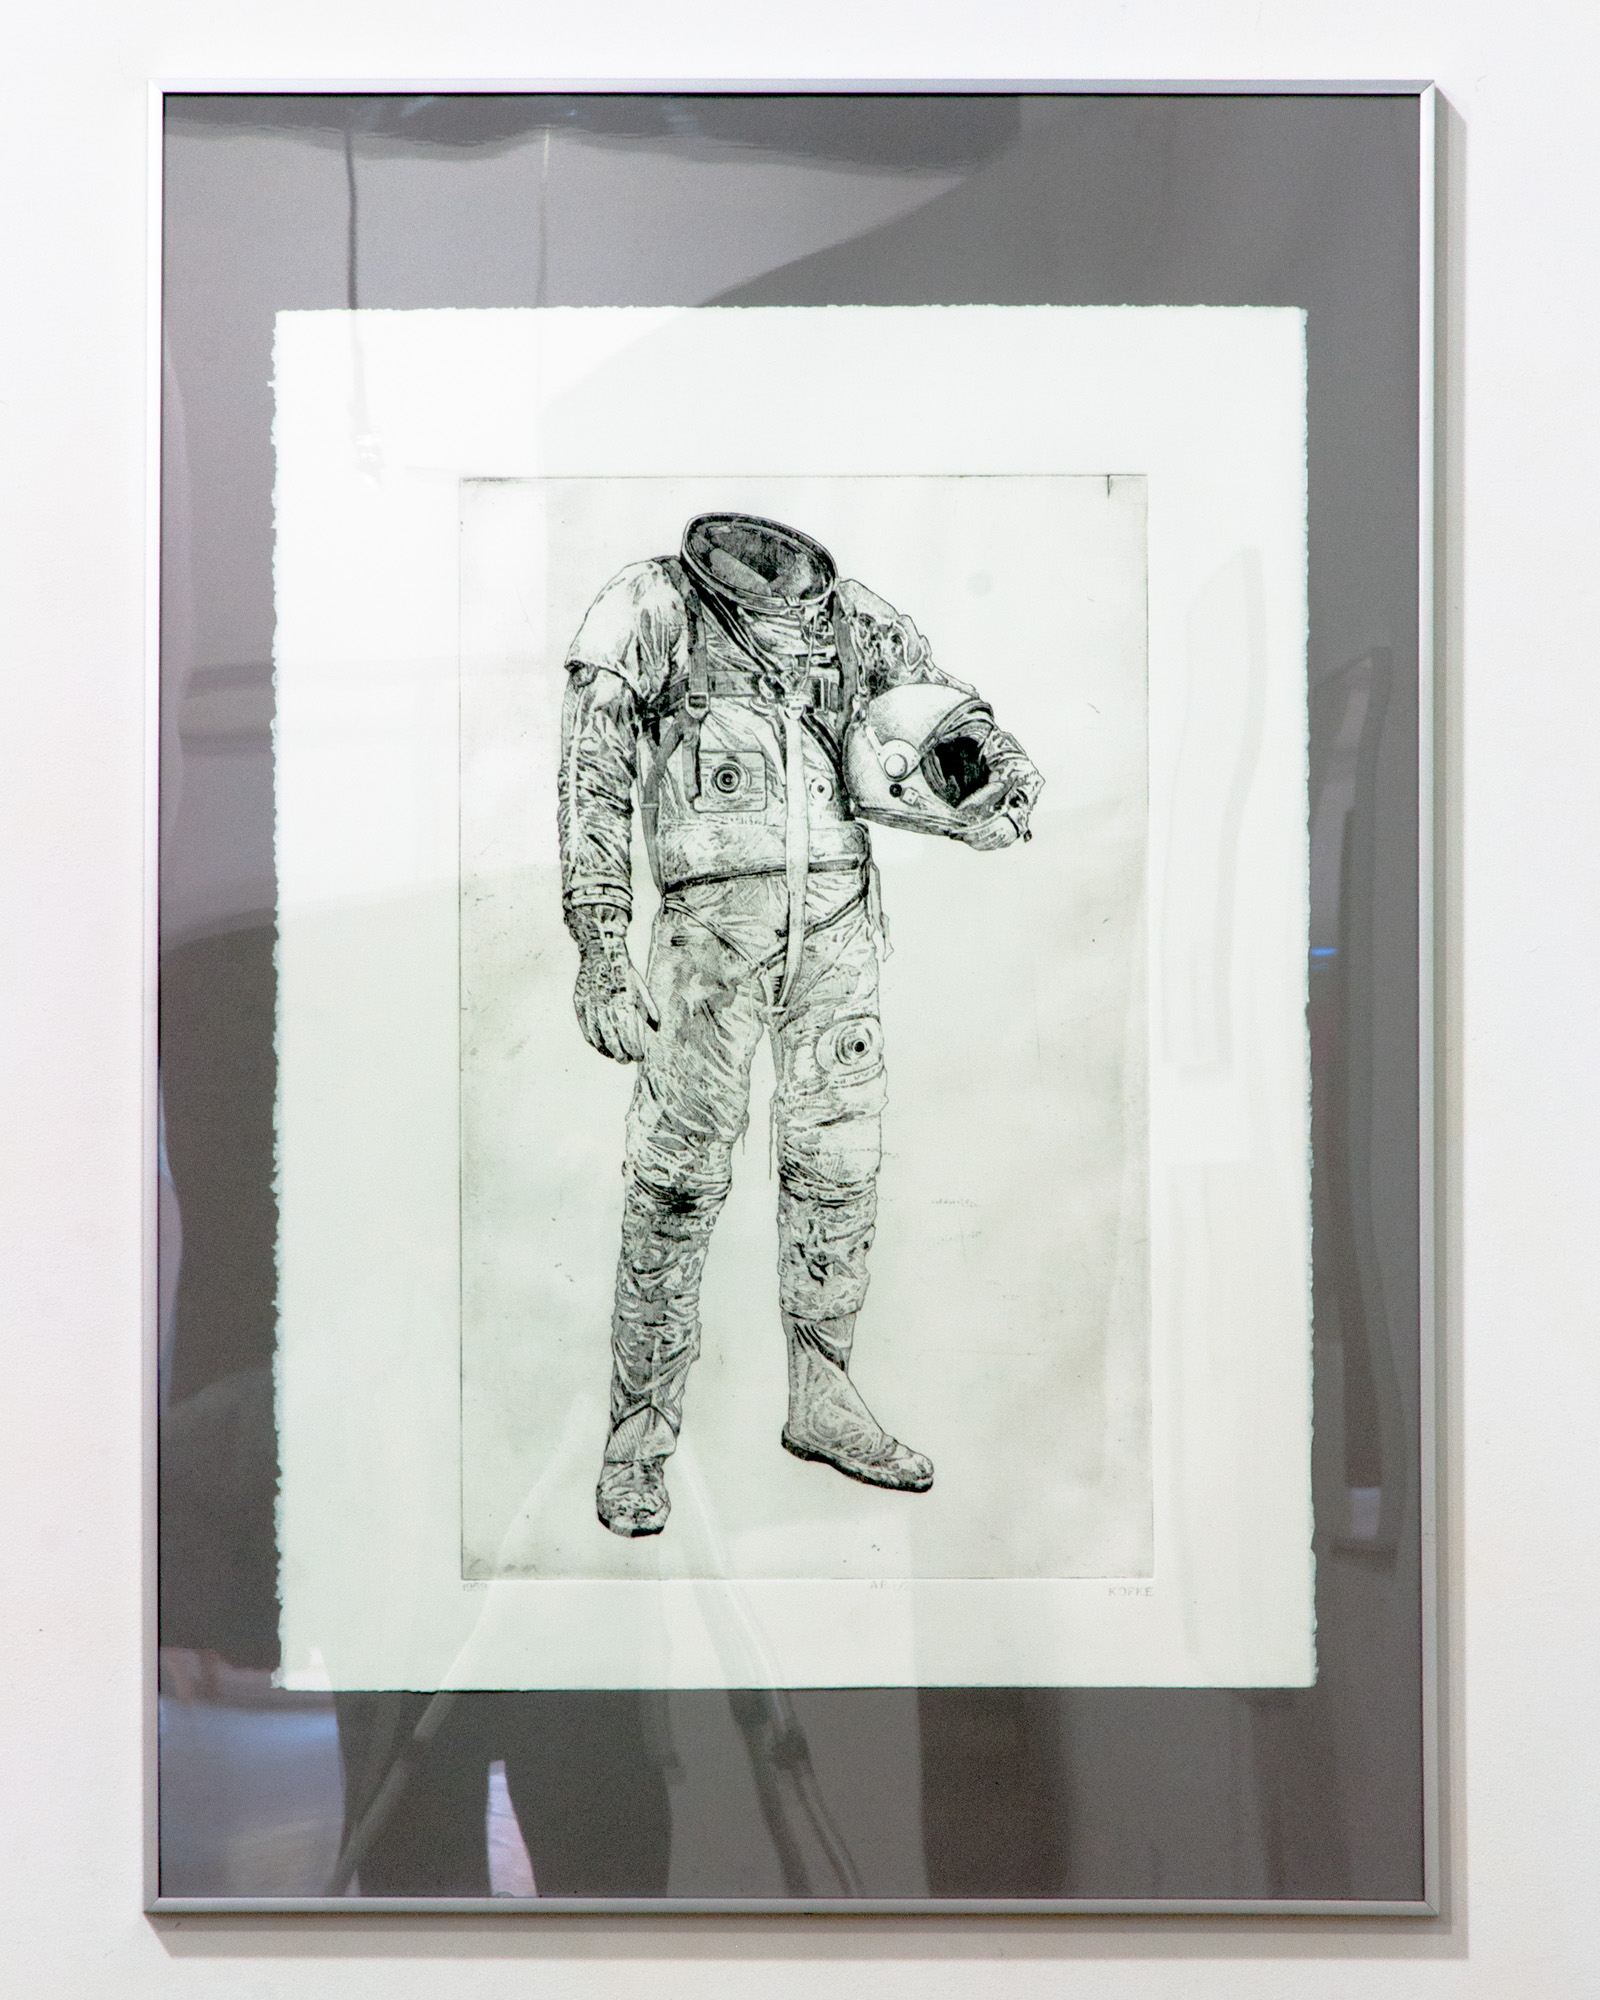 1959 (Mark IV) etching 22 x 30 inches JKO 099G